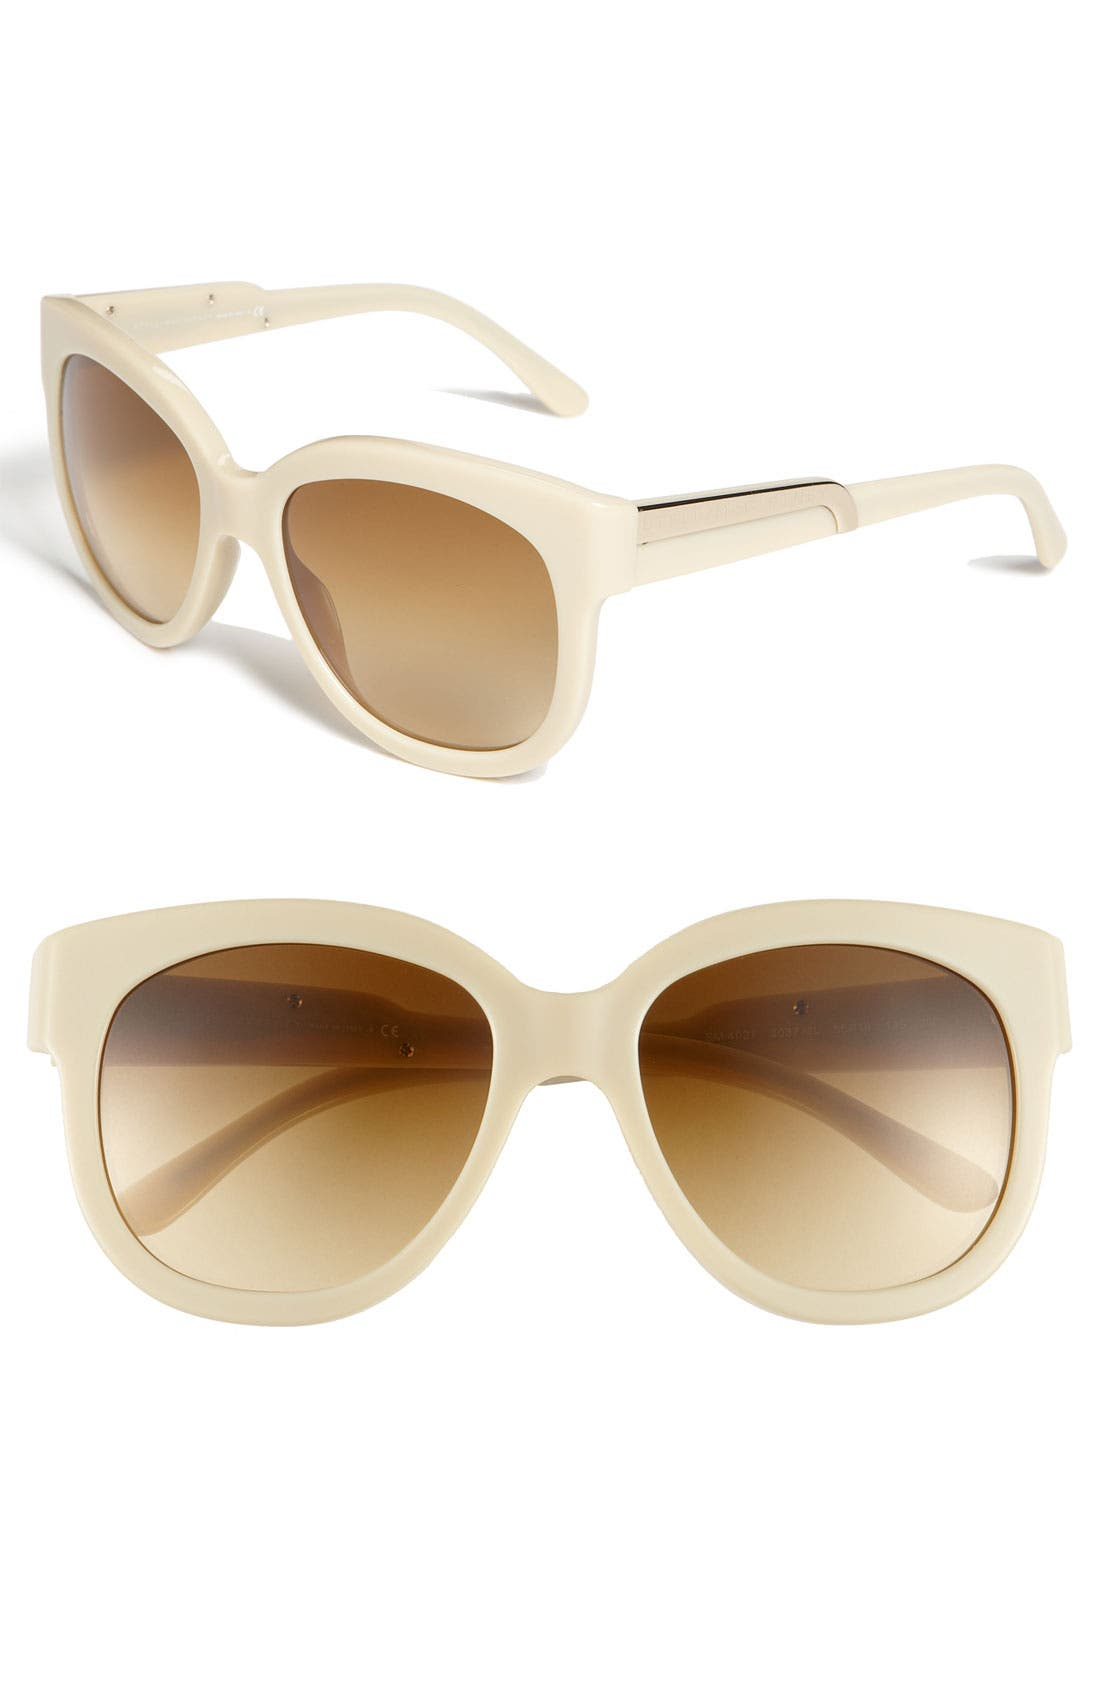 Alternate Image 1 Selected - Stella McCartney 55mm Oversized Cat's-Eye Sunglasses